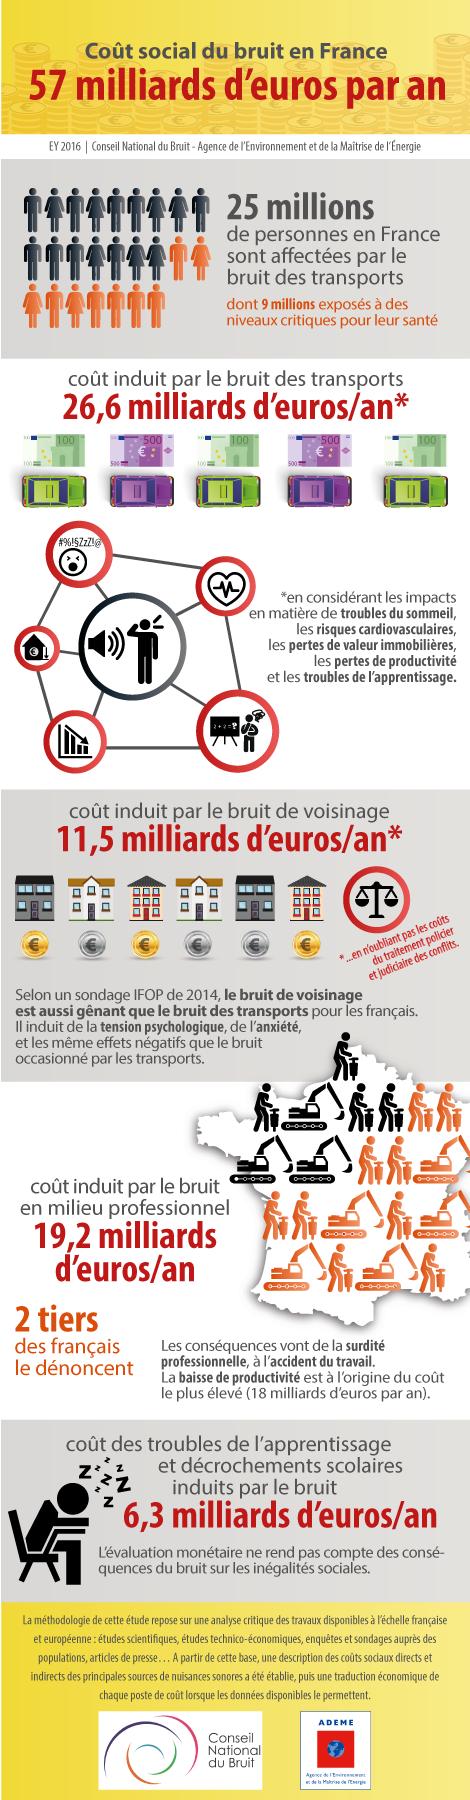 infographie-orfea-coutsocialbruit